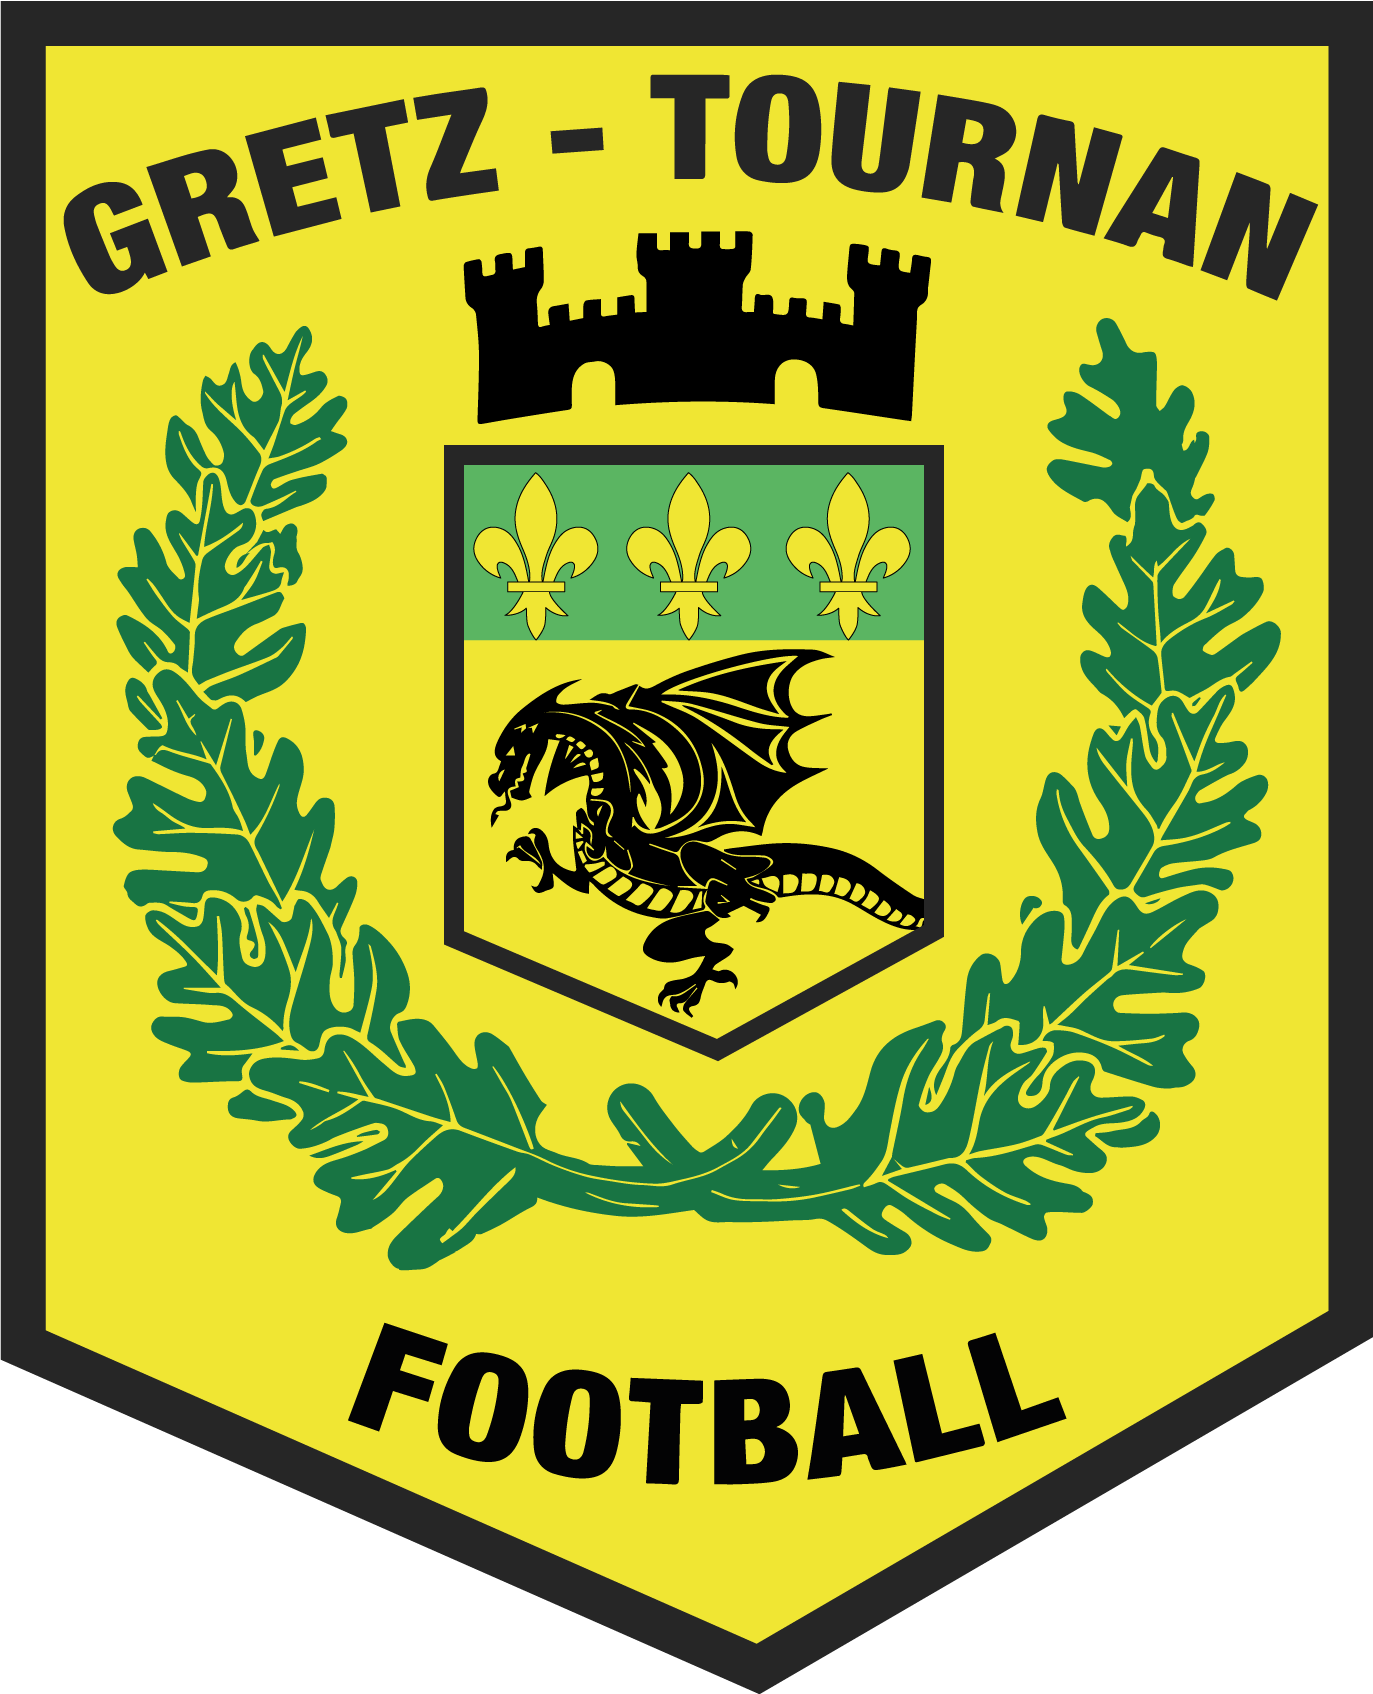 GRETZ TOURNAN SP.C.